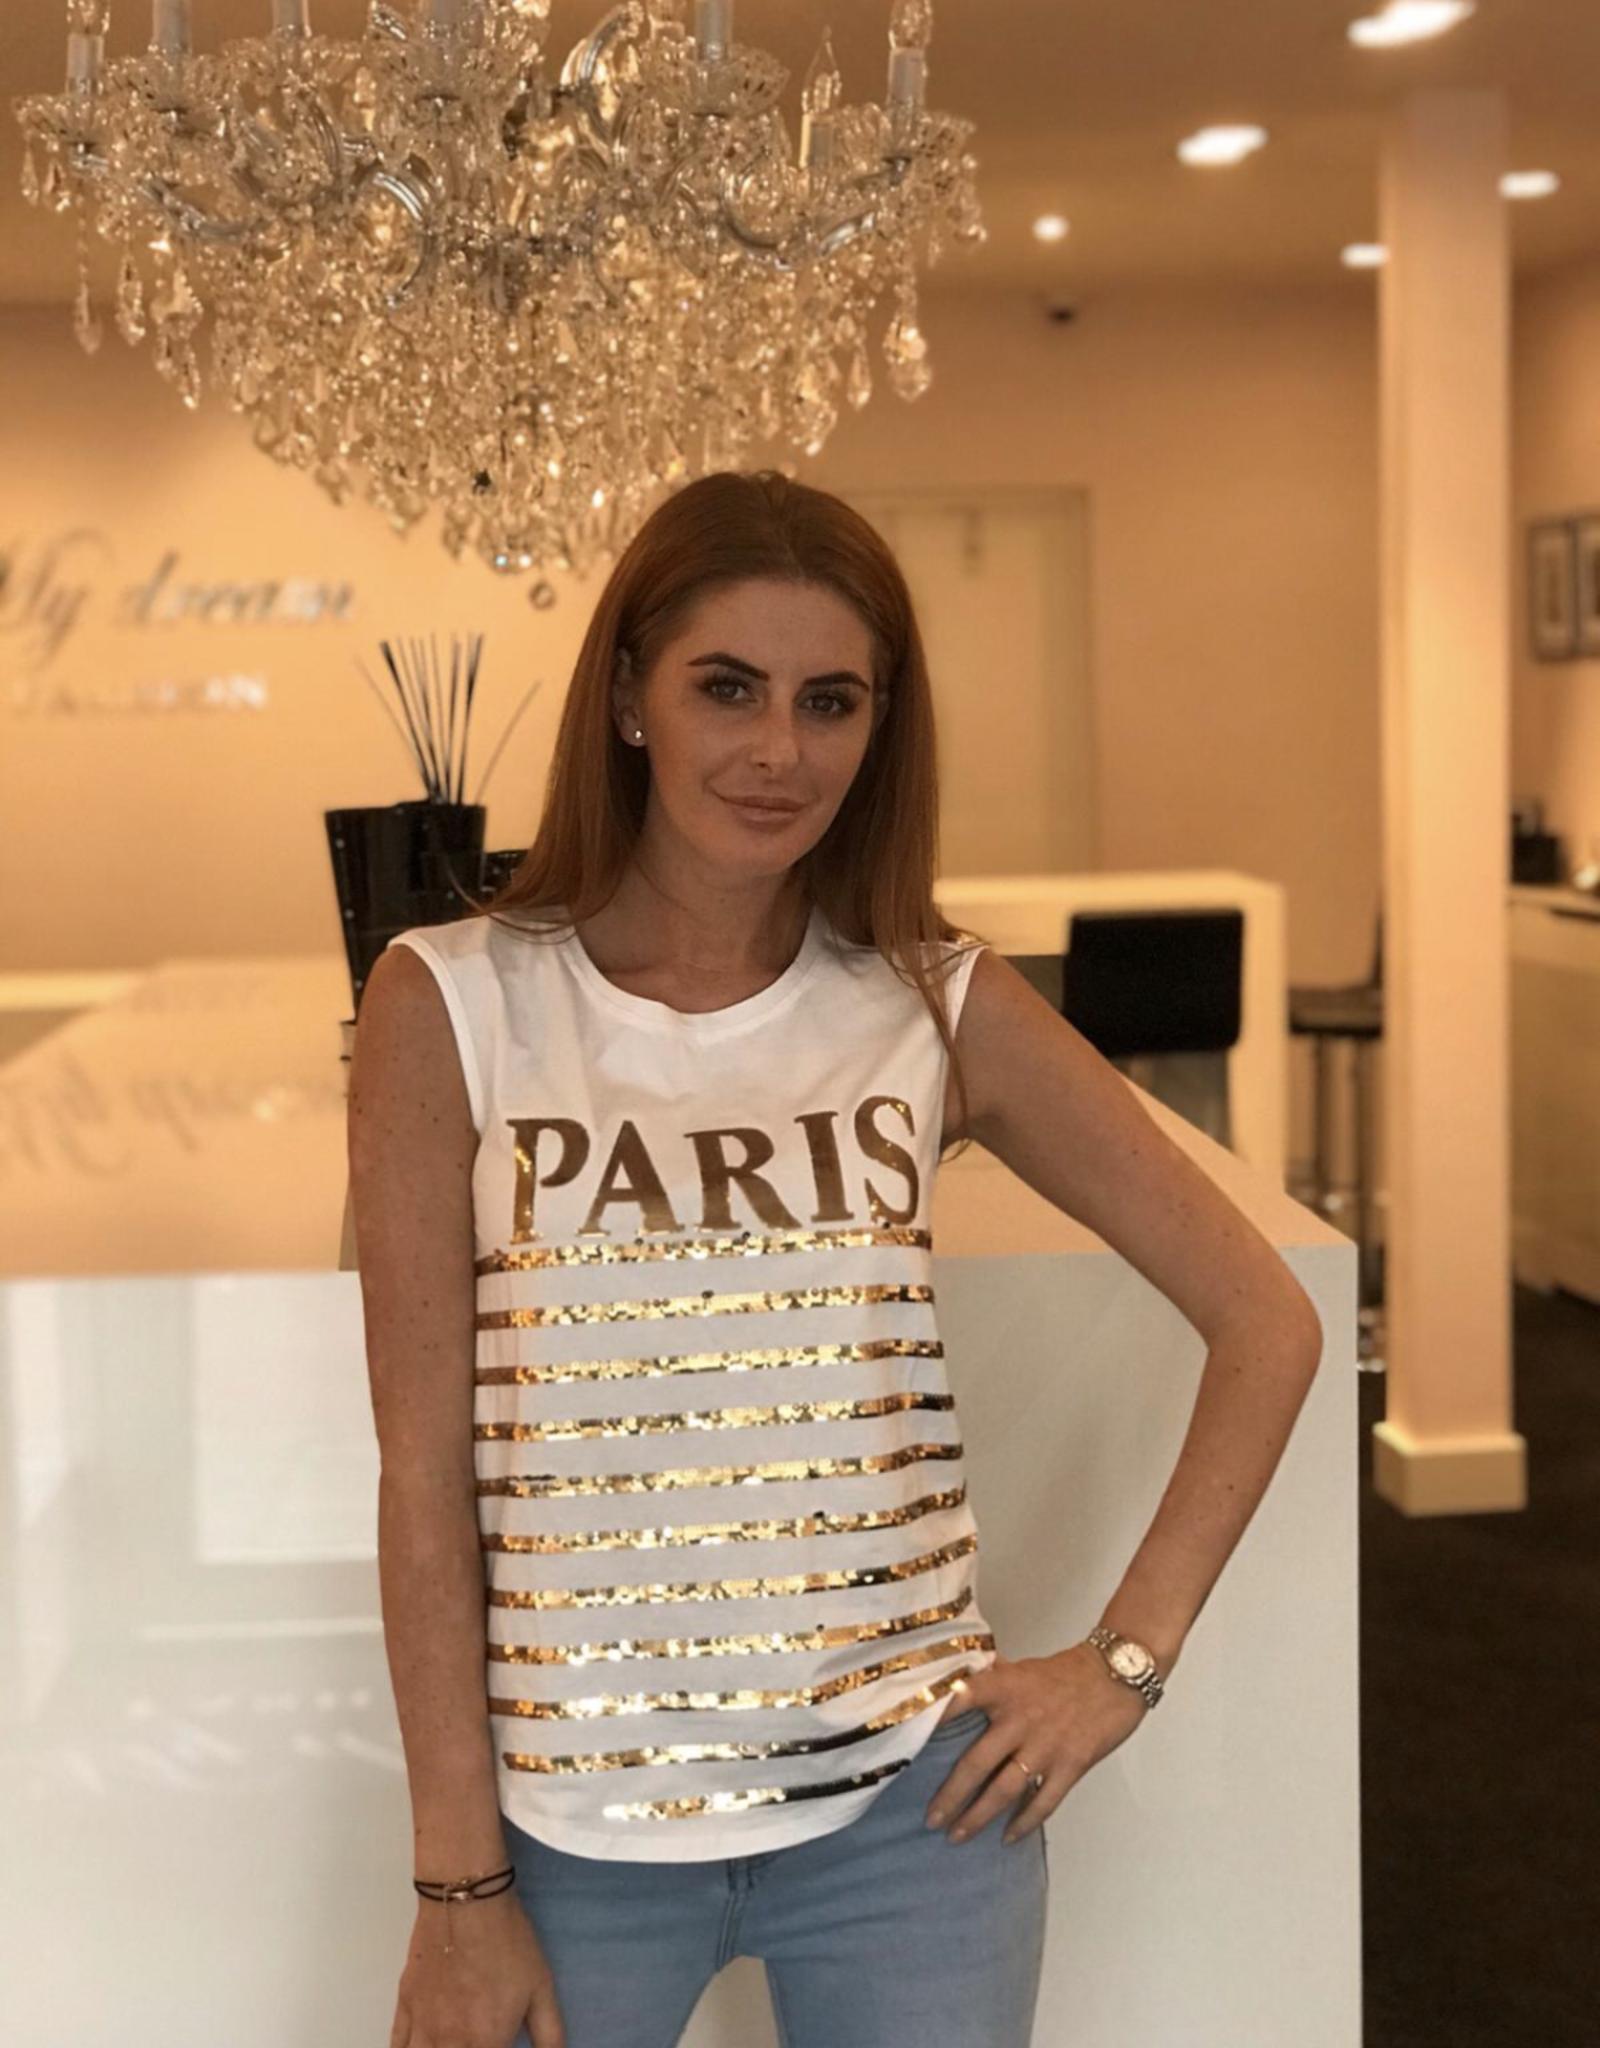 Gold paris t-shirt